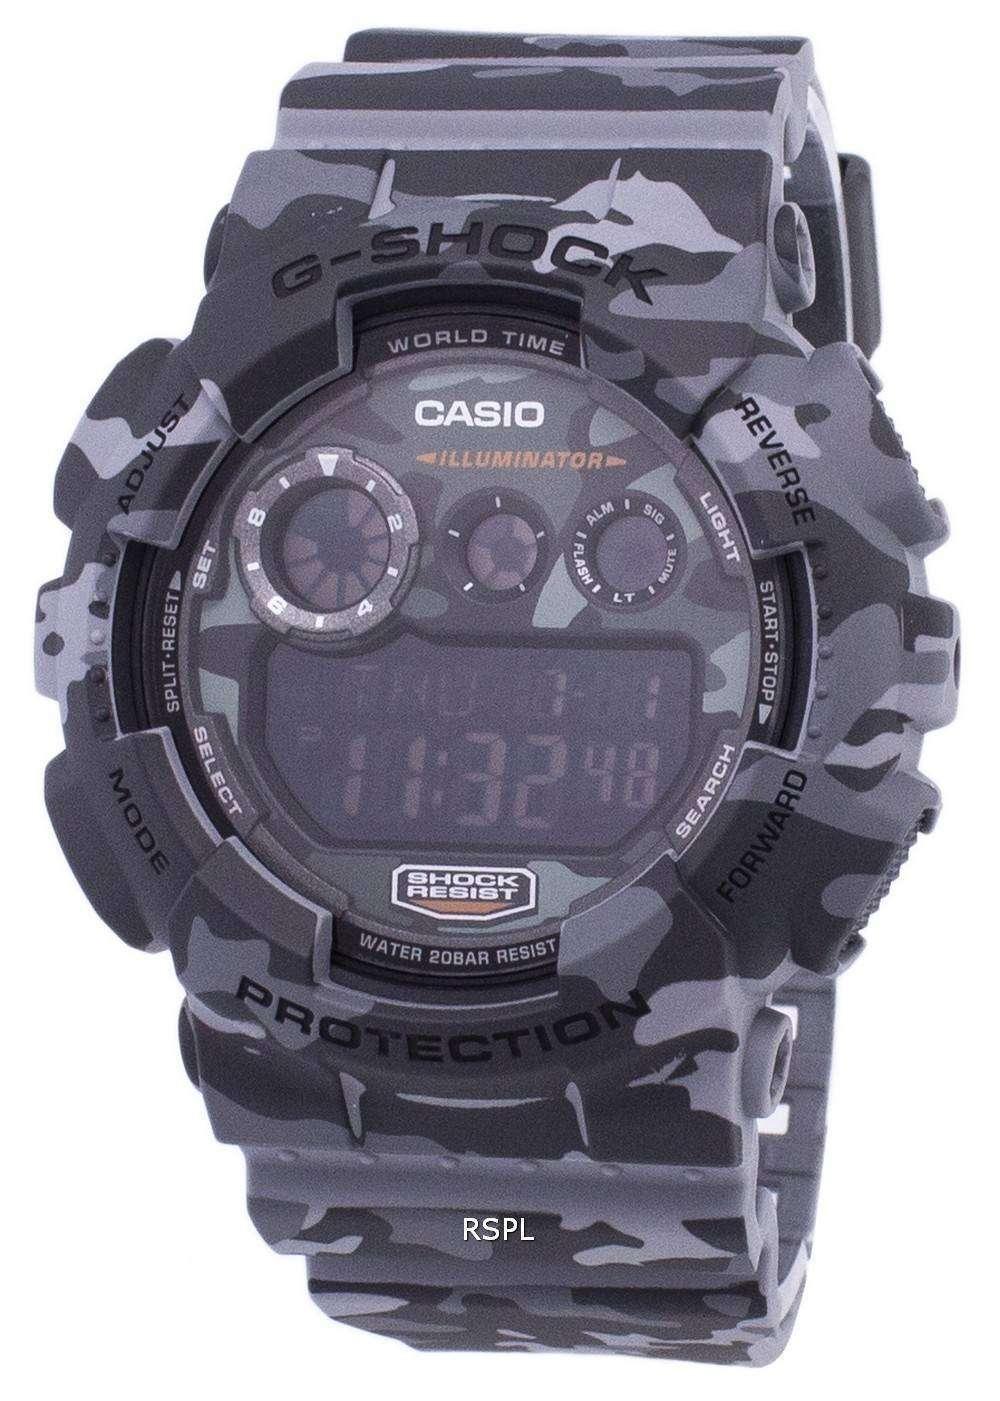 Casio G-Shock Digital Camouflage Series GD-120CM-8 Mens Watch b3a5241dc4